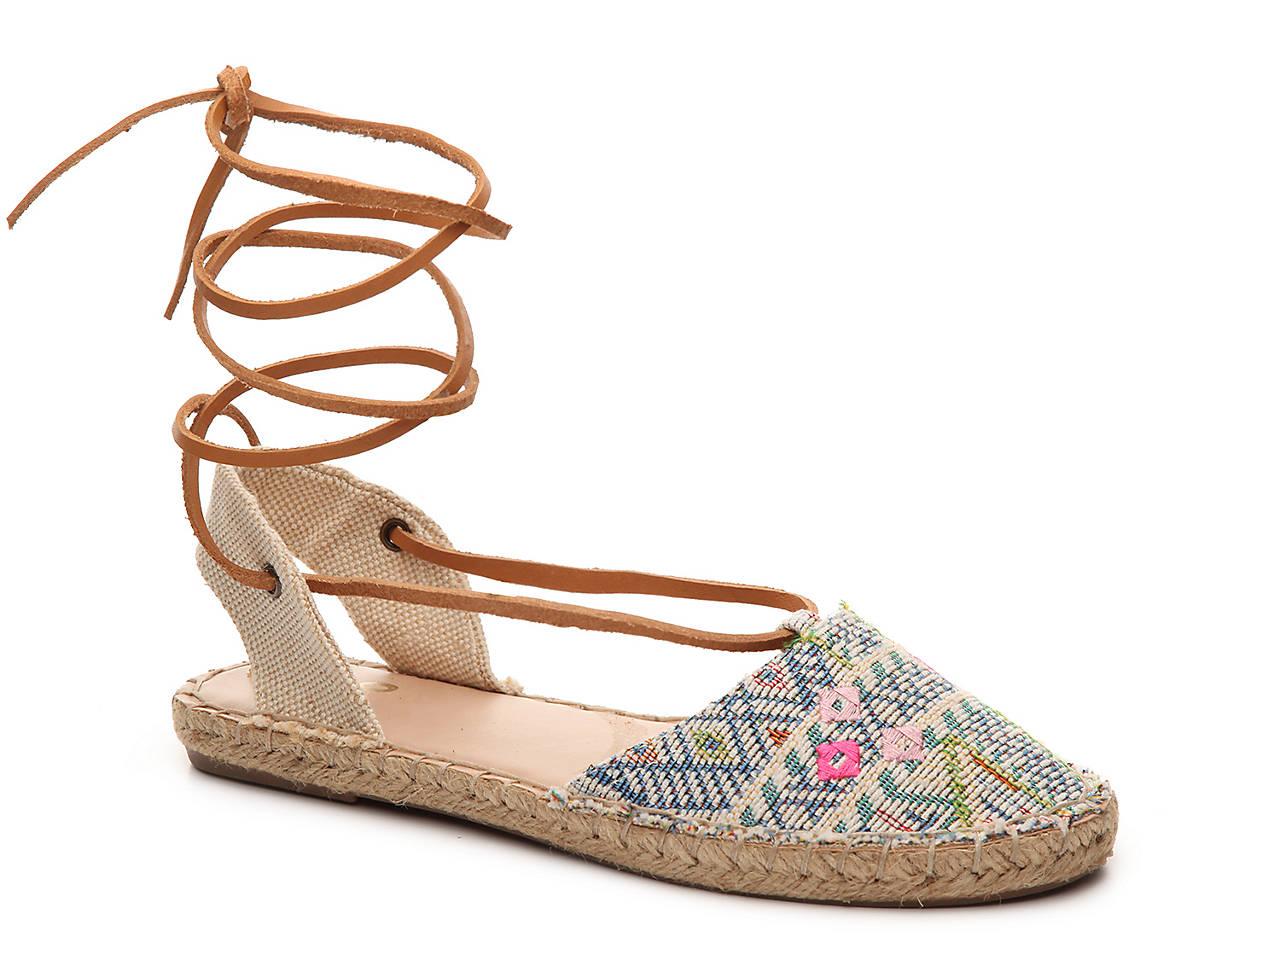 4c4e6f9f140 Mix No. 6 Canina Espadrille Flat Women s Shoes